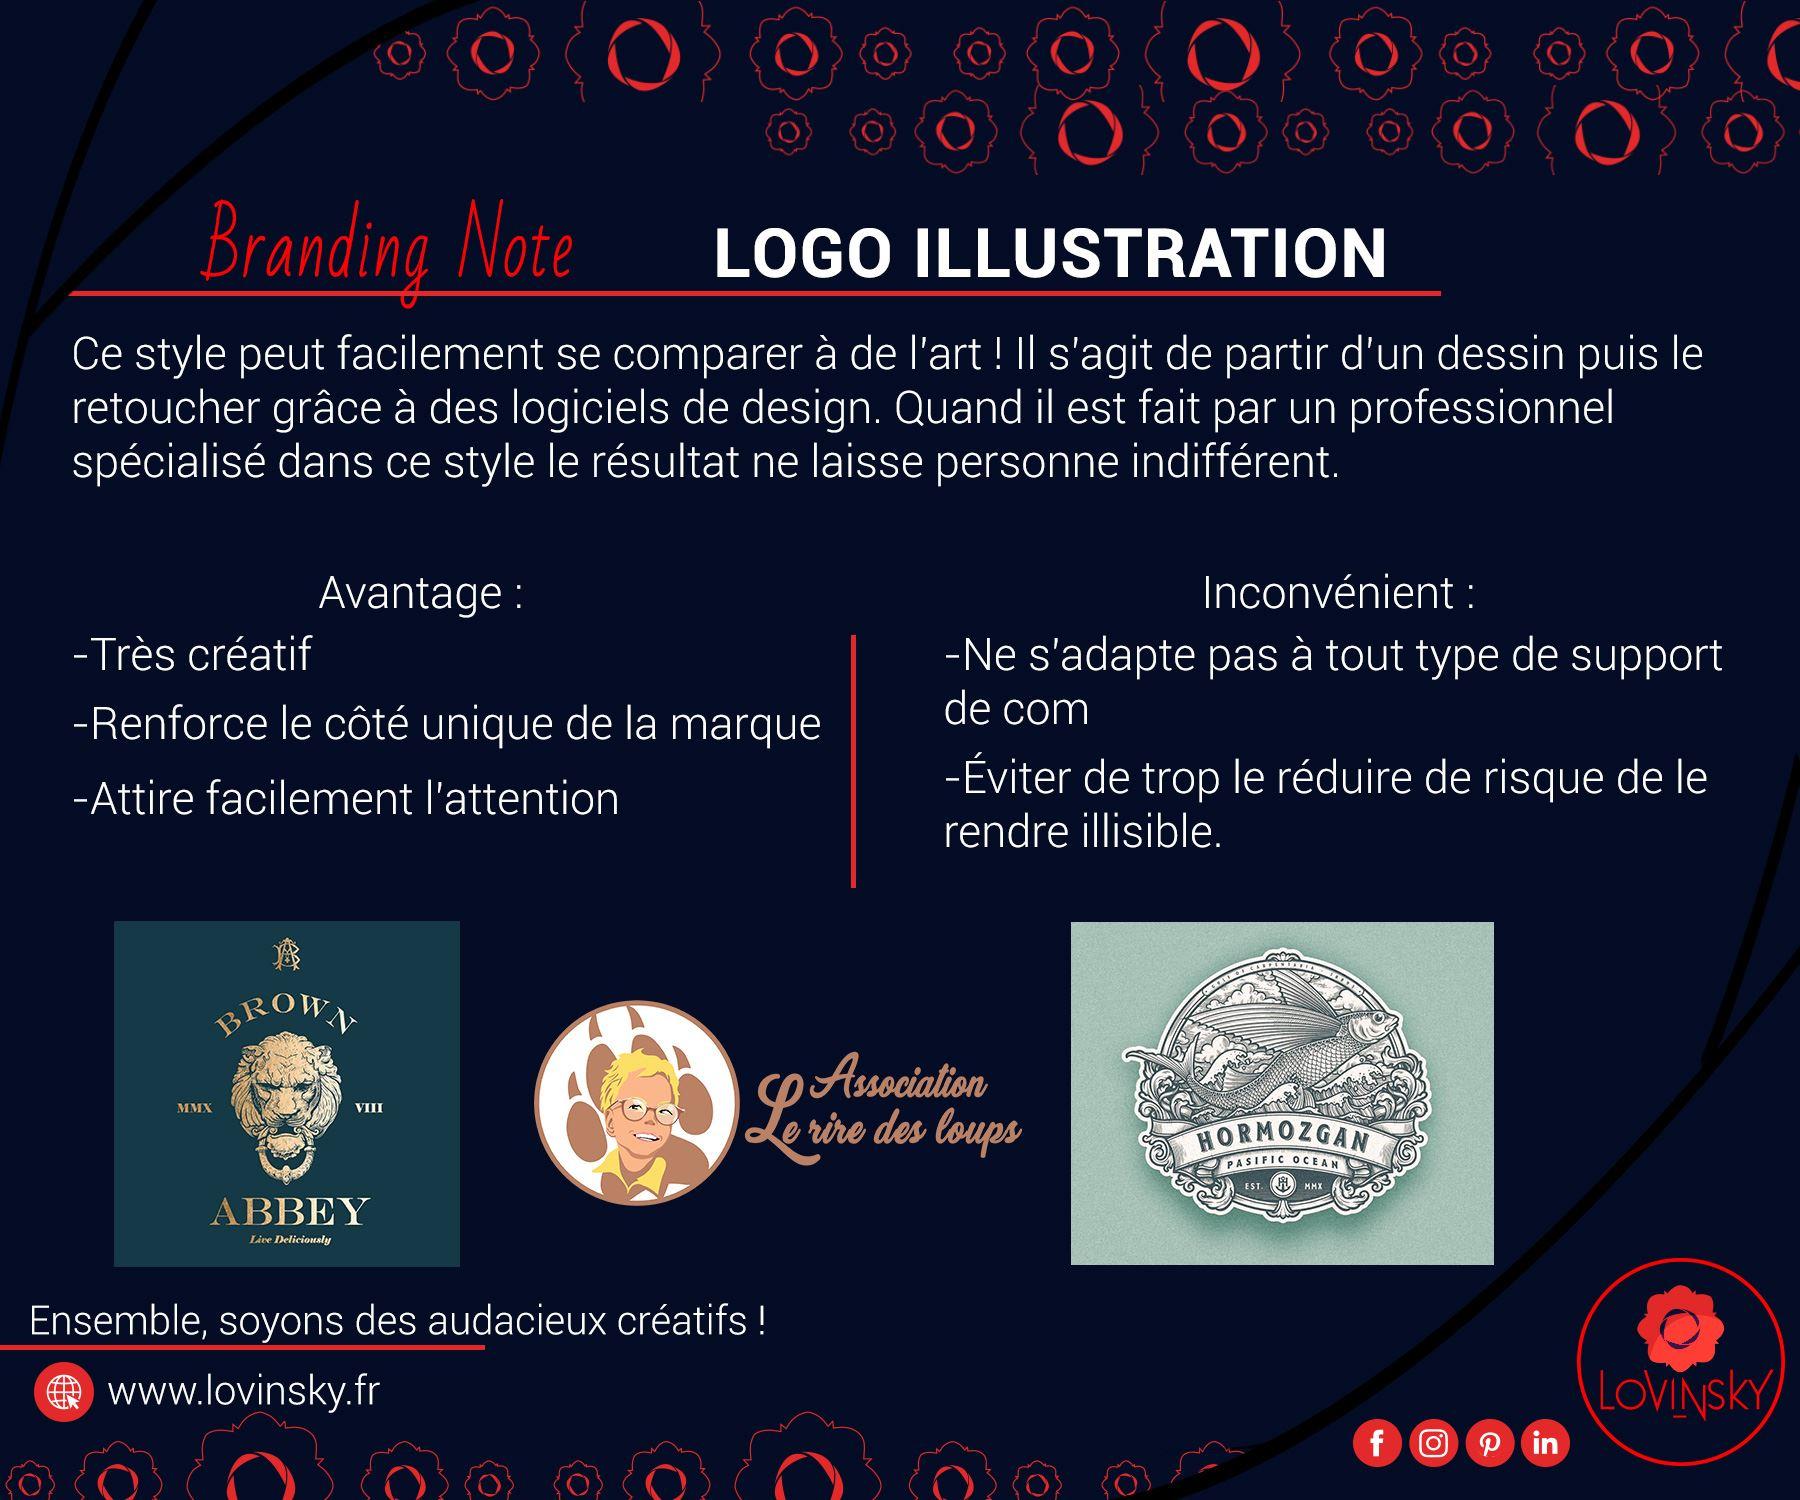 logo-illustration lovinsky graphiste webdesigner freelance indépendant nantes 44